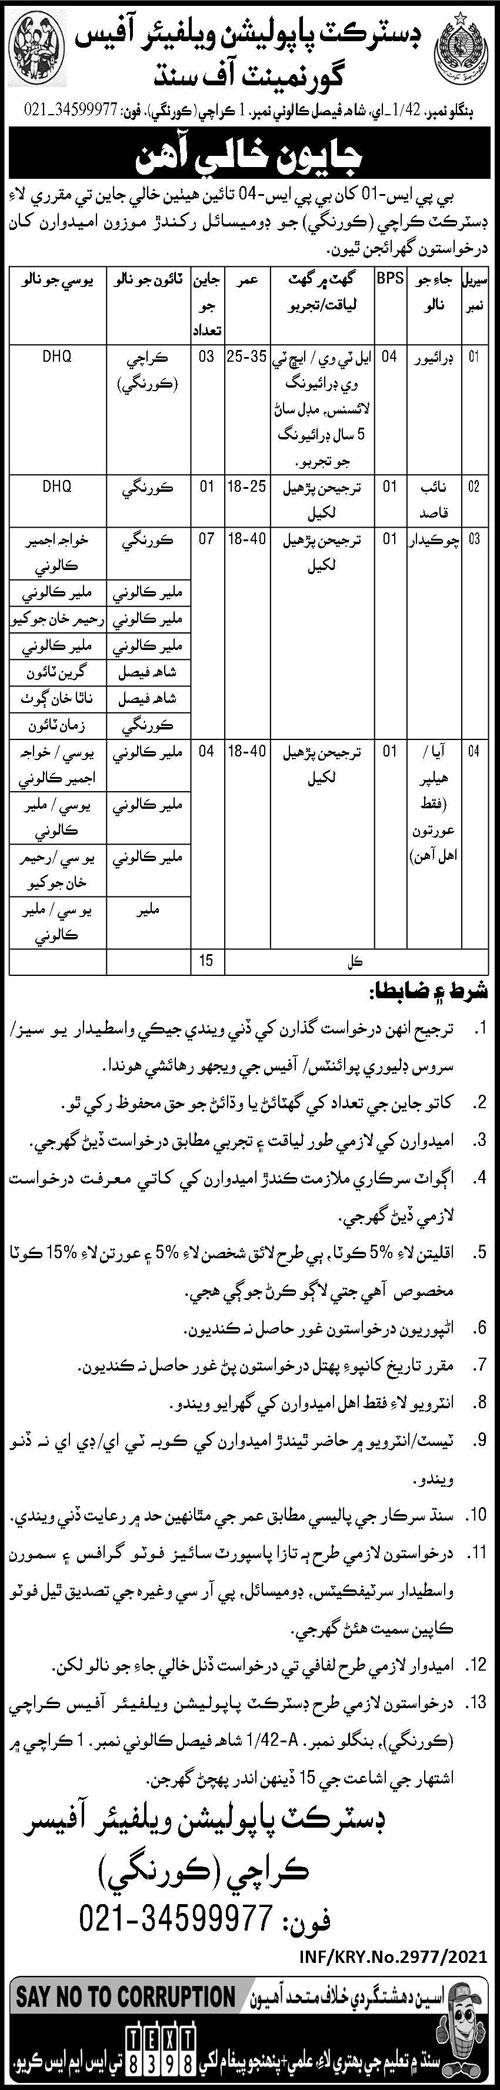 District Population Office Karachi Jobs 2021